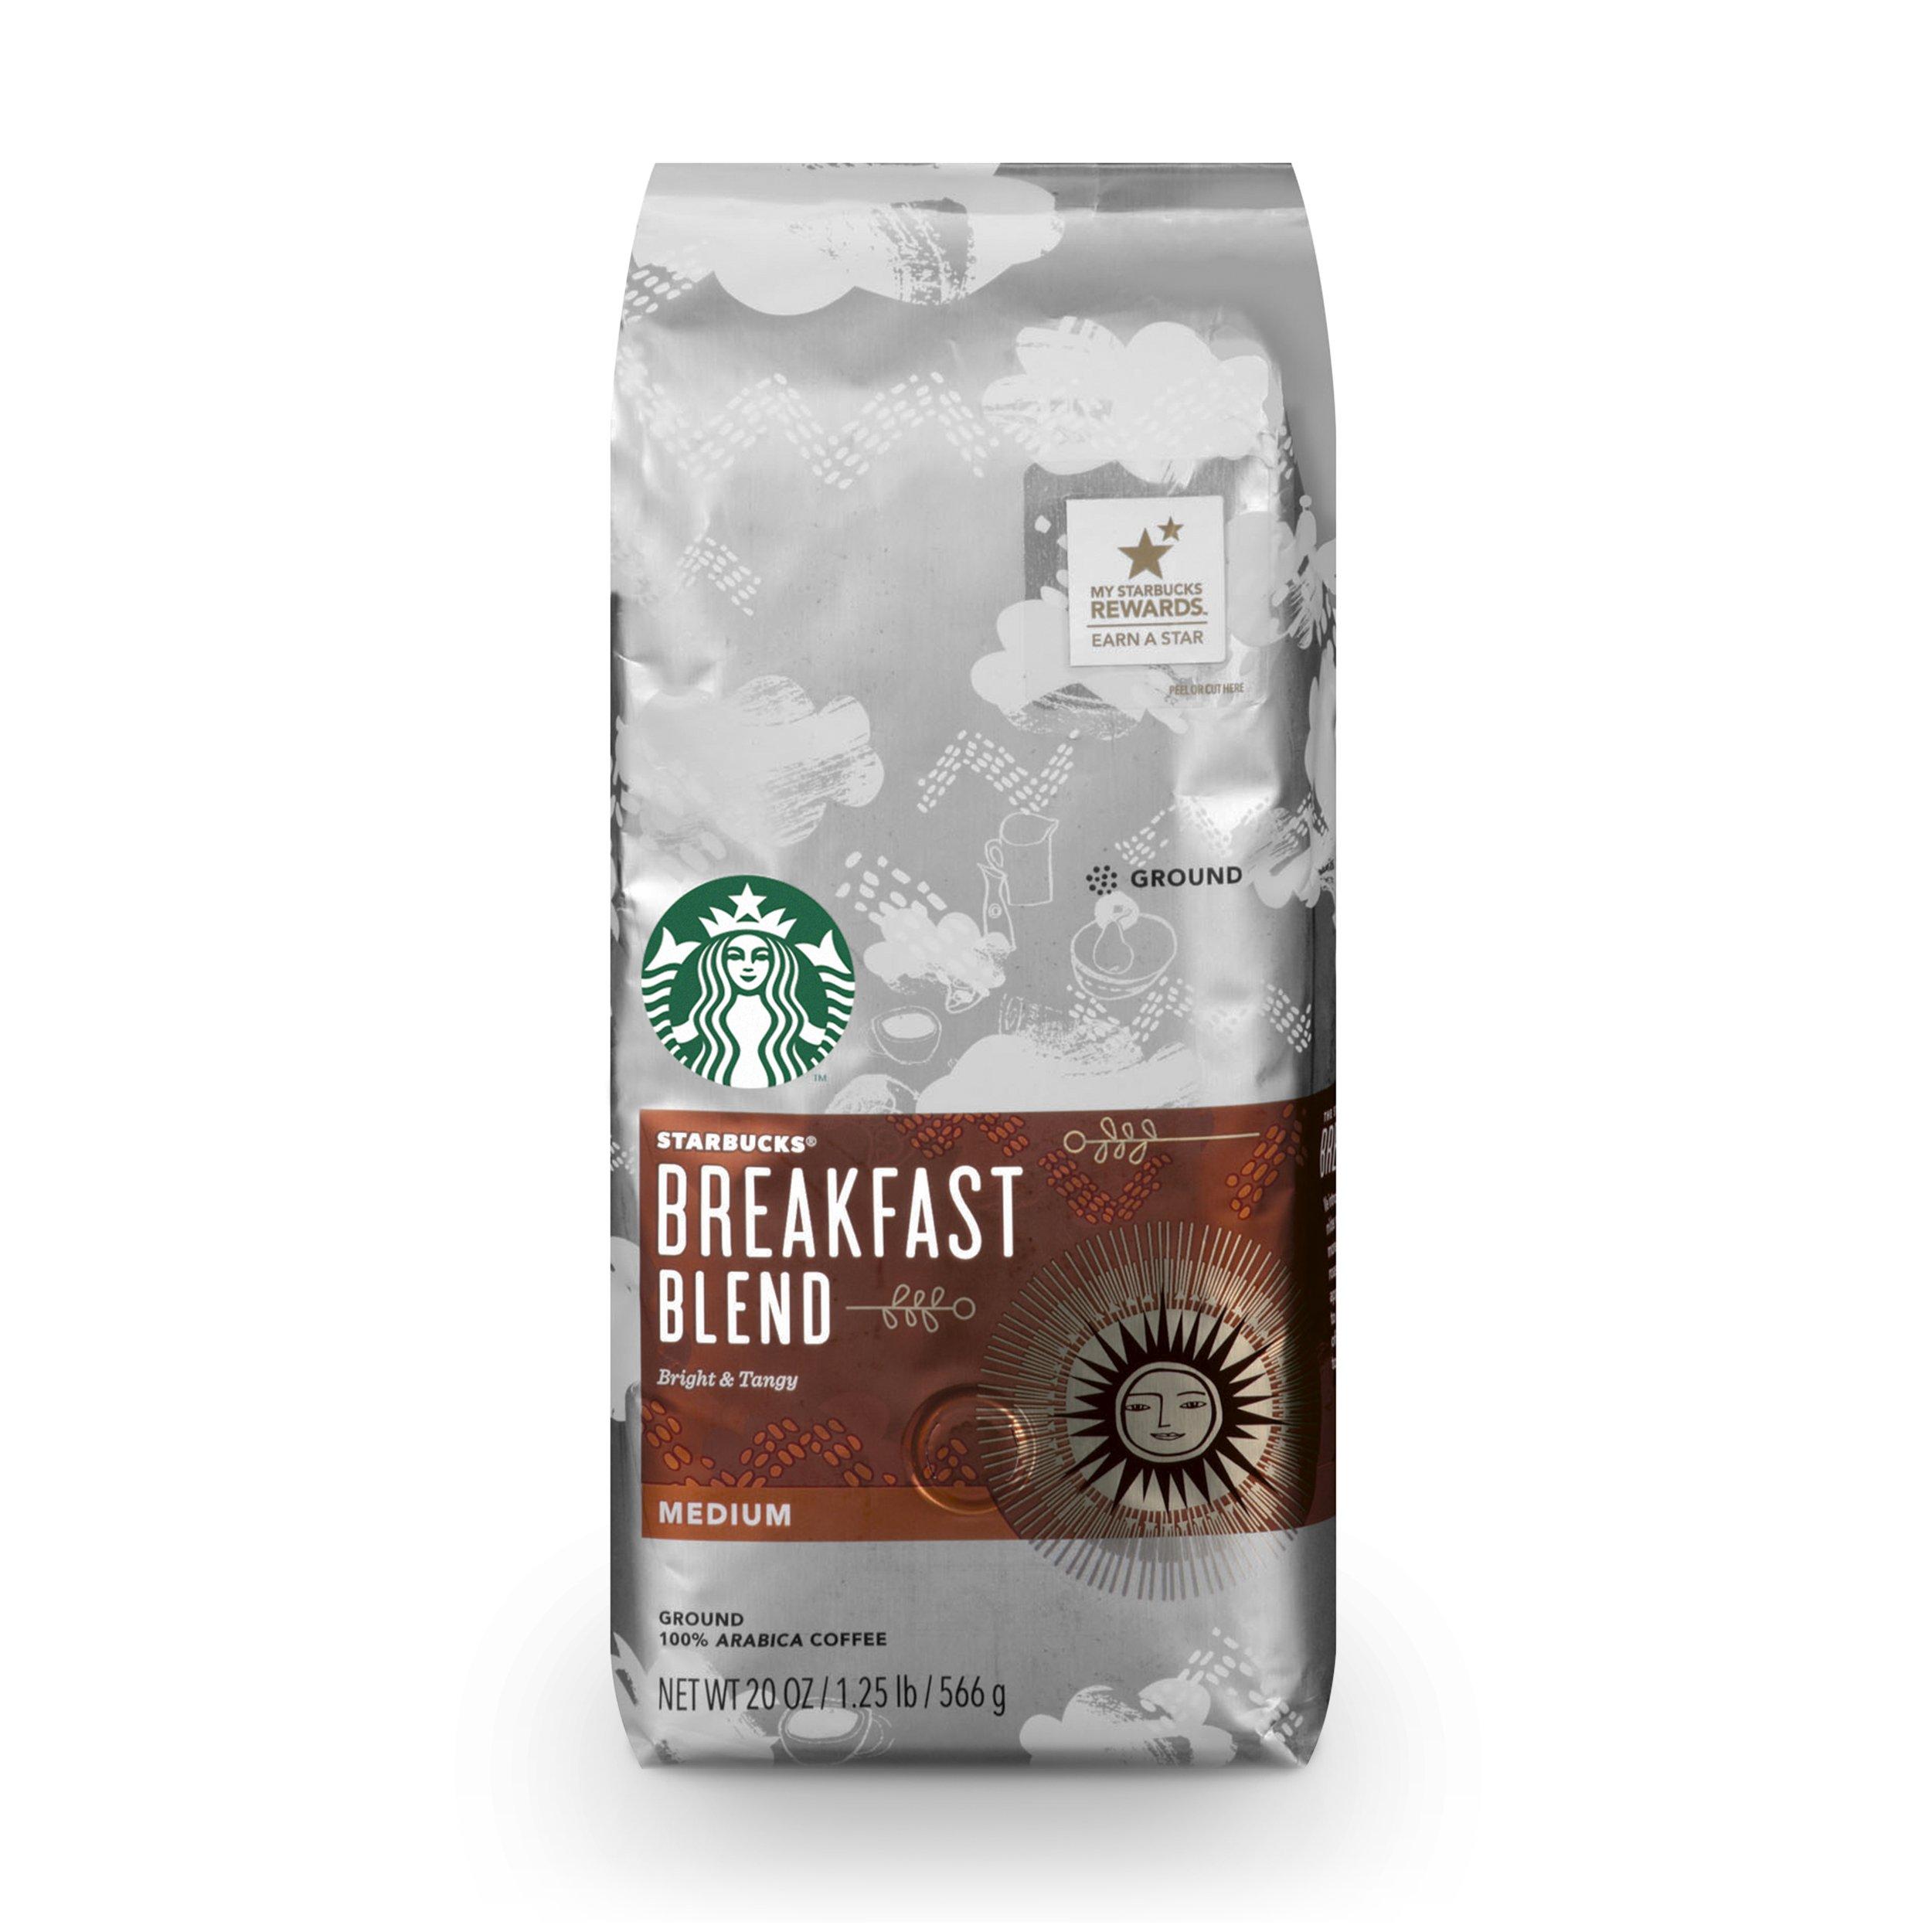 Starbucks Breakfast Blend Medium Roast Ground Coffee, 20-Ounce Bag by Starbucks